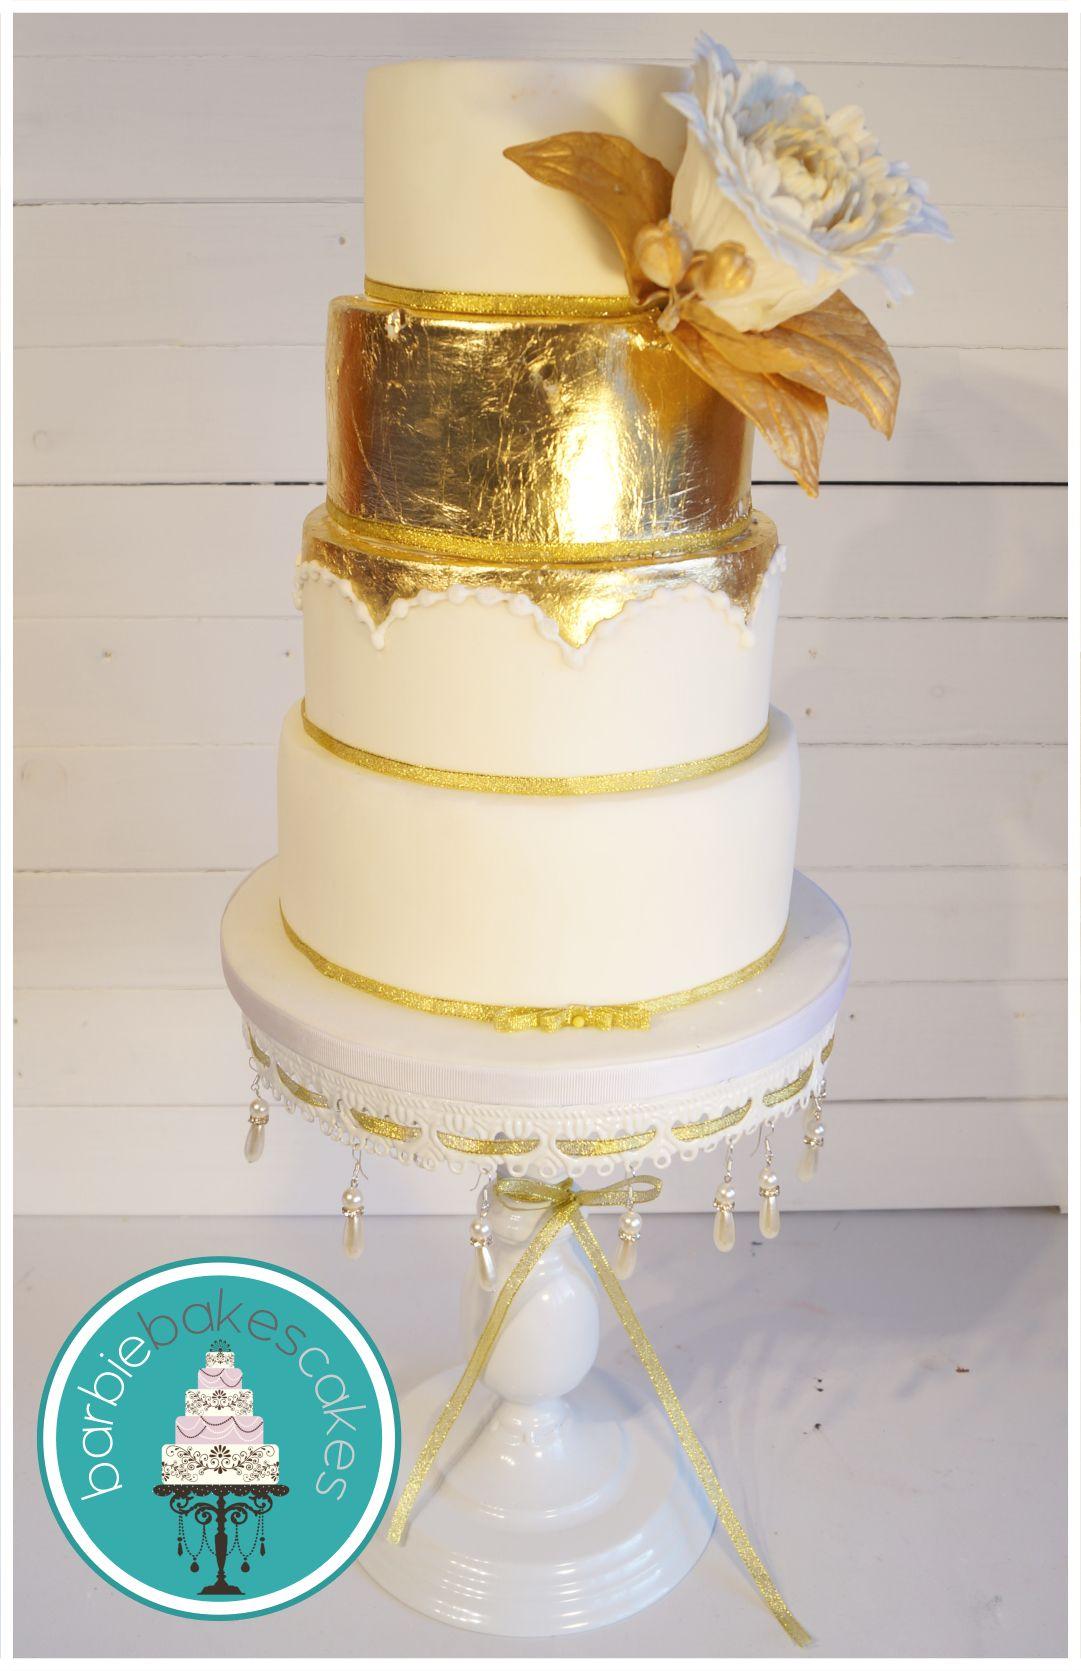 Gold leaf wedding cake barbie bakes cakes web rbiebakesca